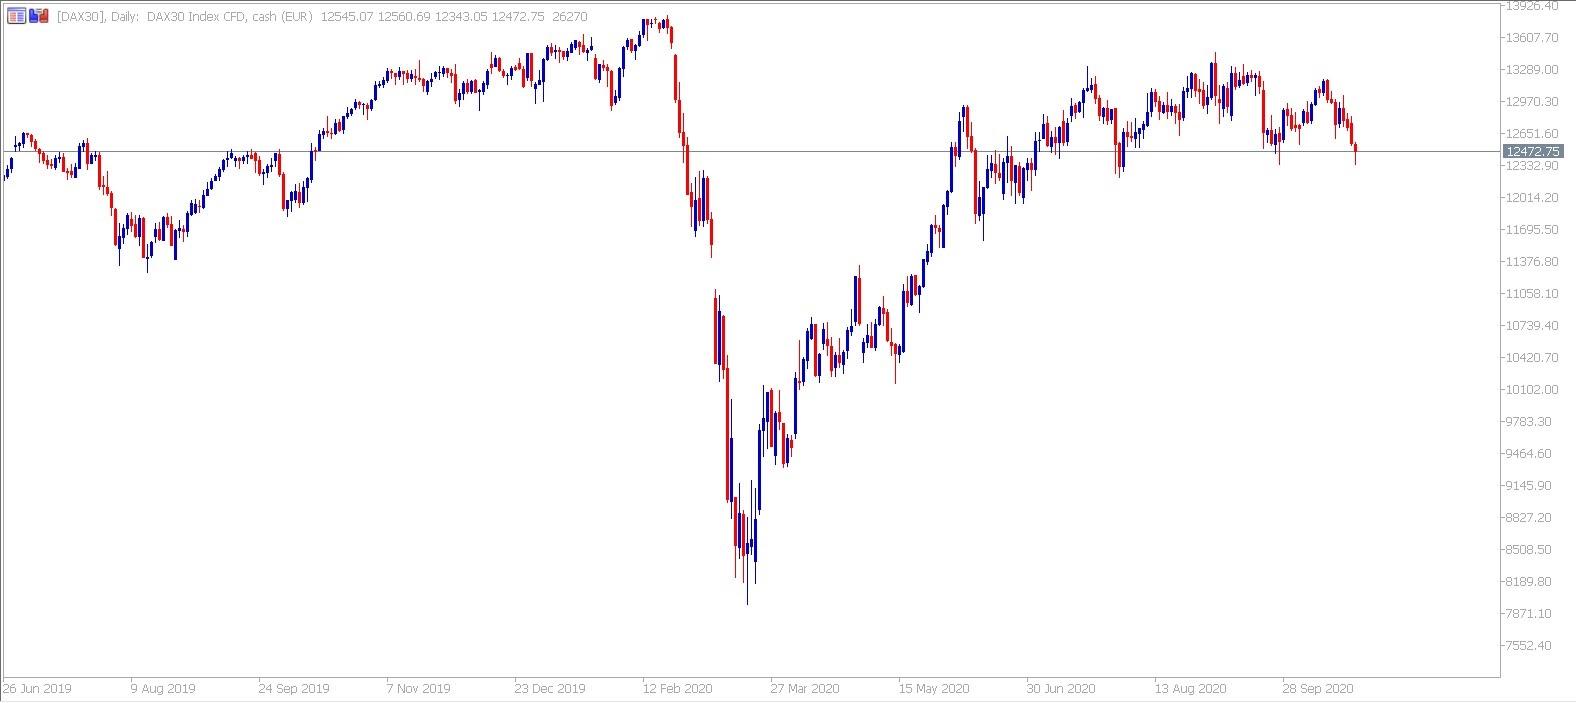 Admiral Markets MetaTrader 5. Daily CFD DAX chart